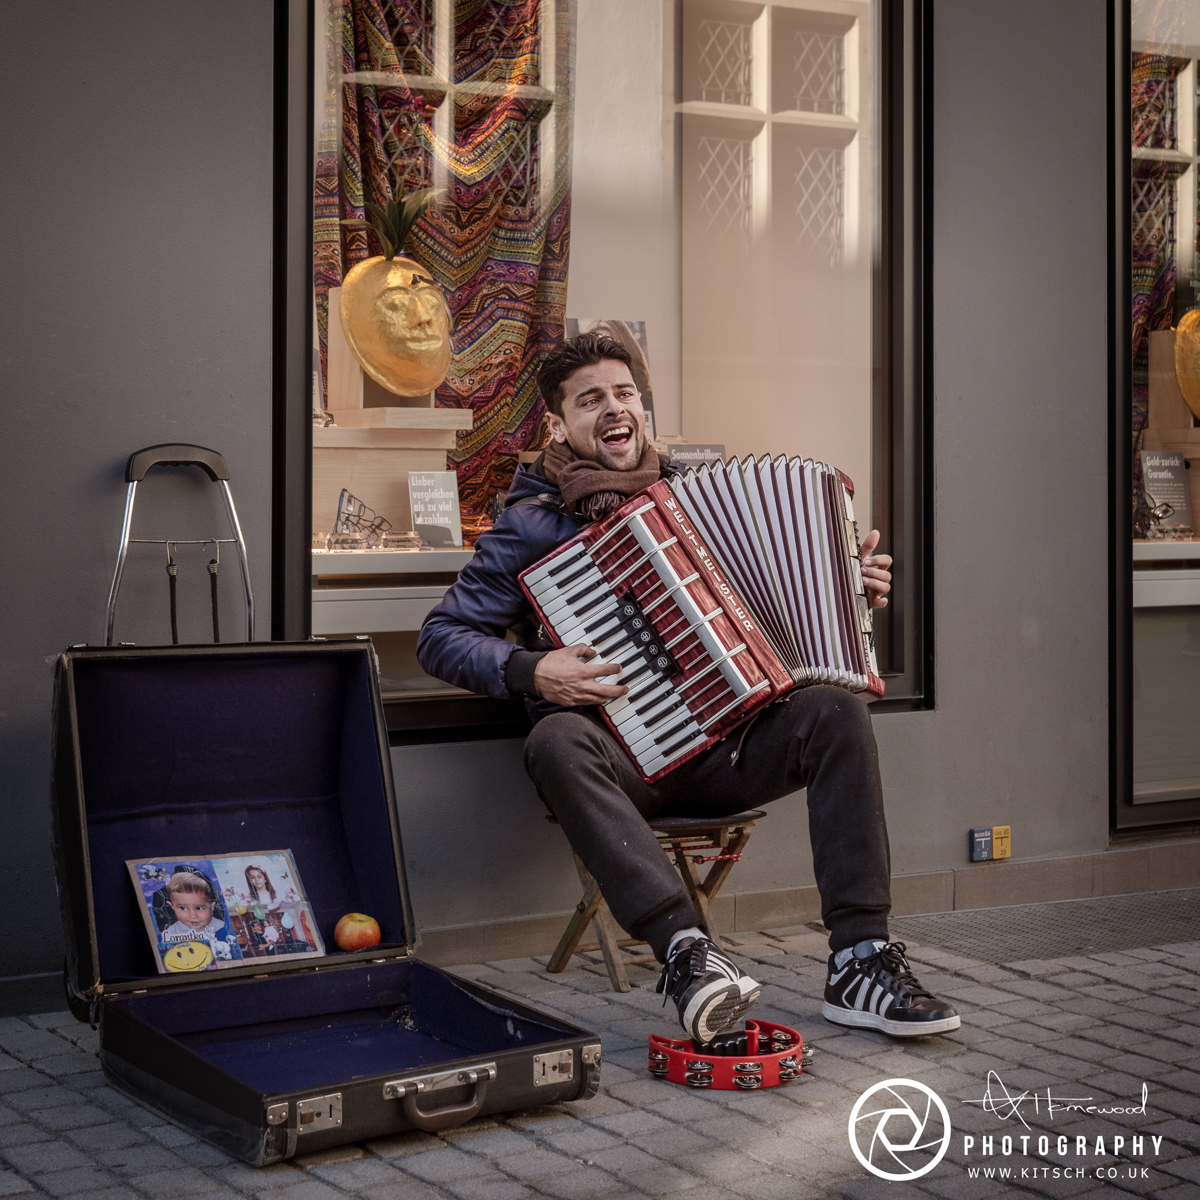 Konstanz Accordian Player